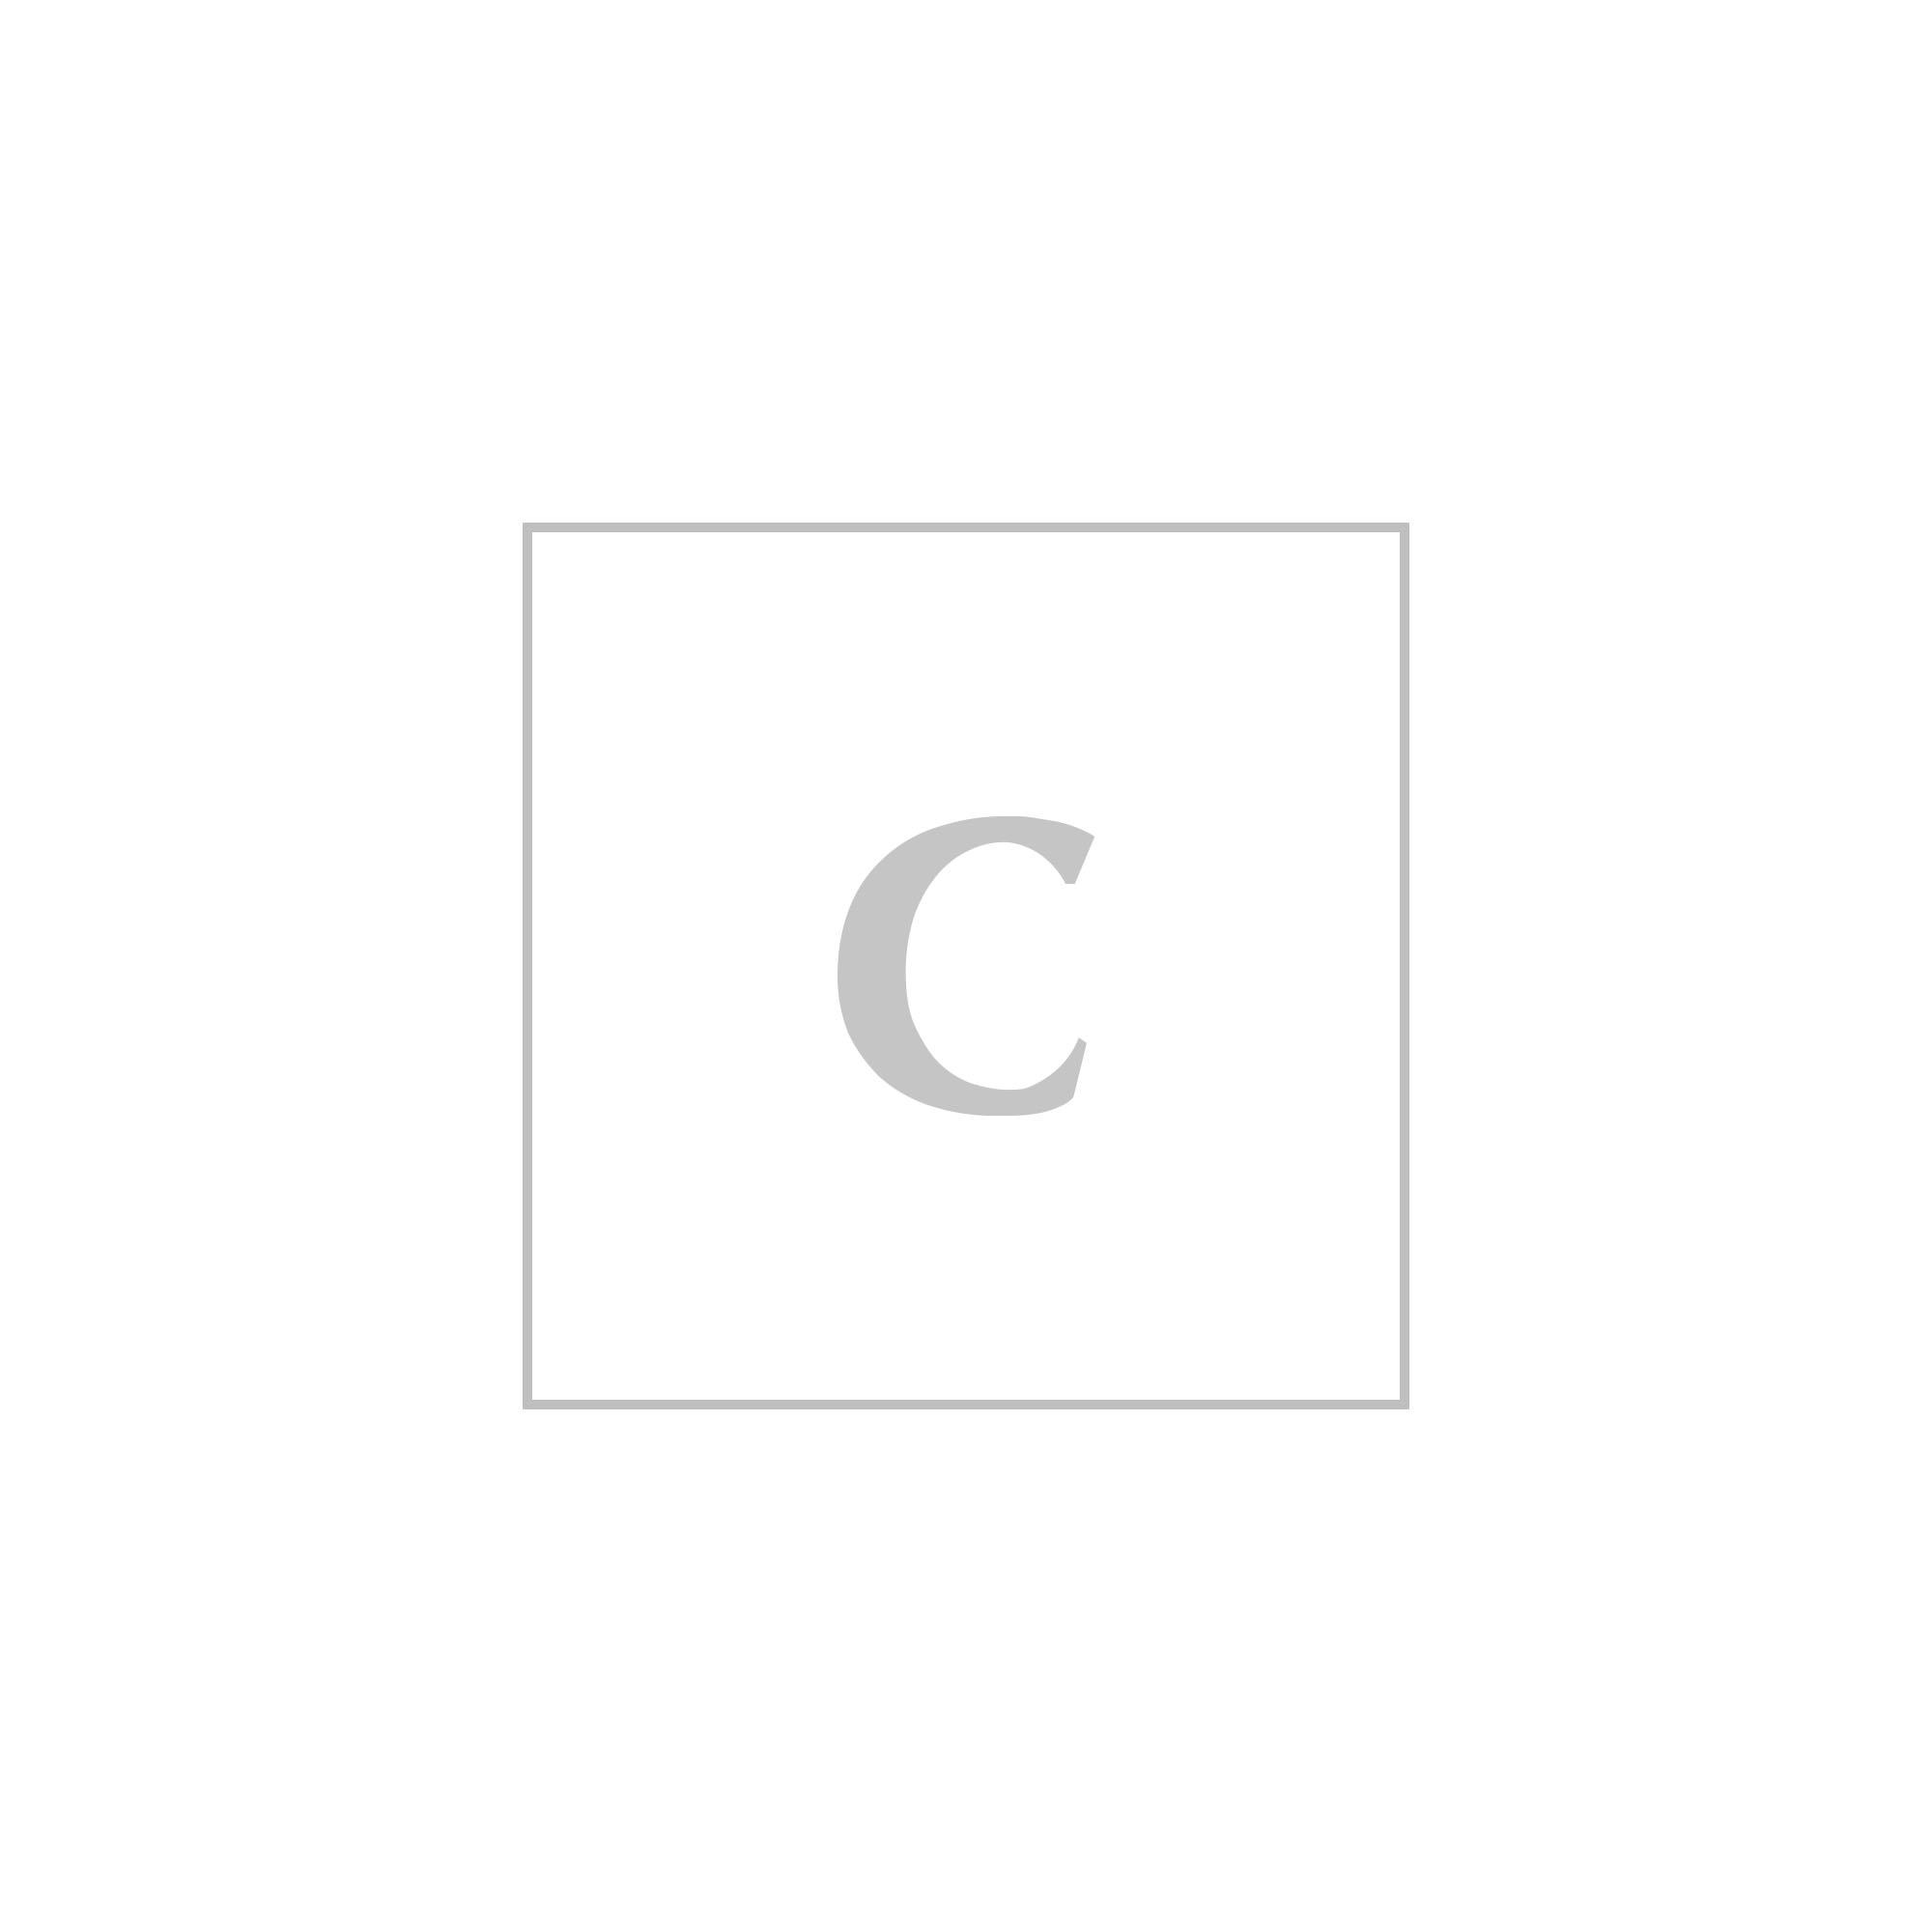 Saint laurent monogram bag